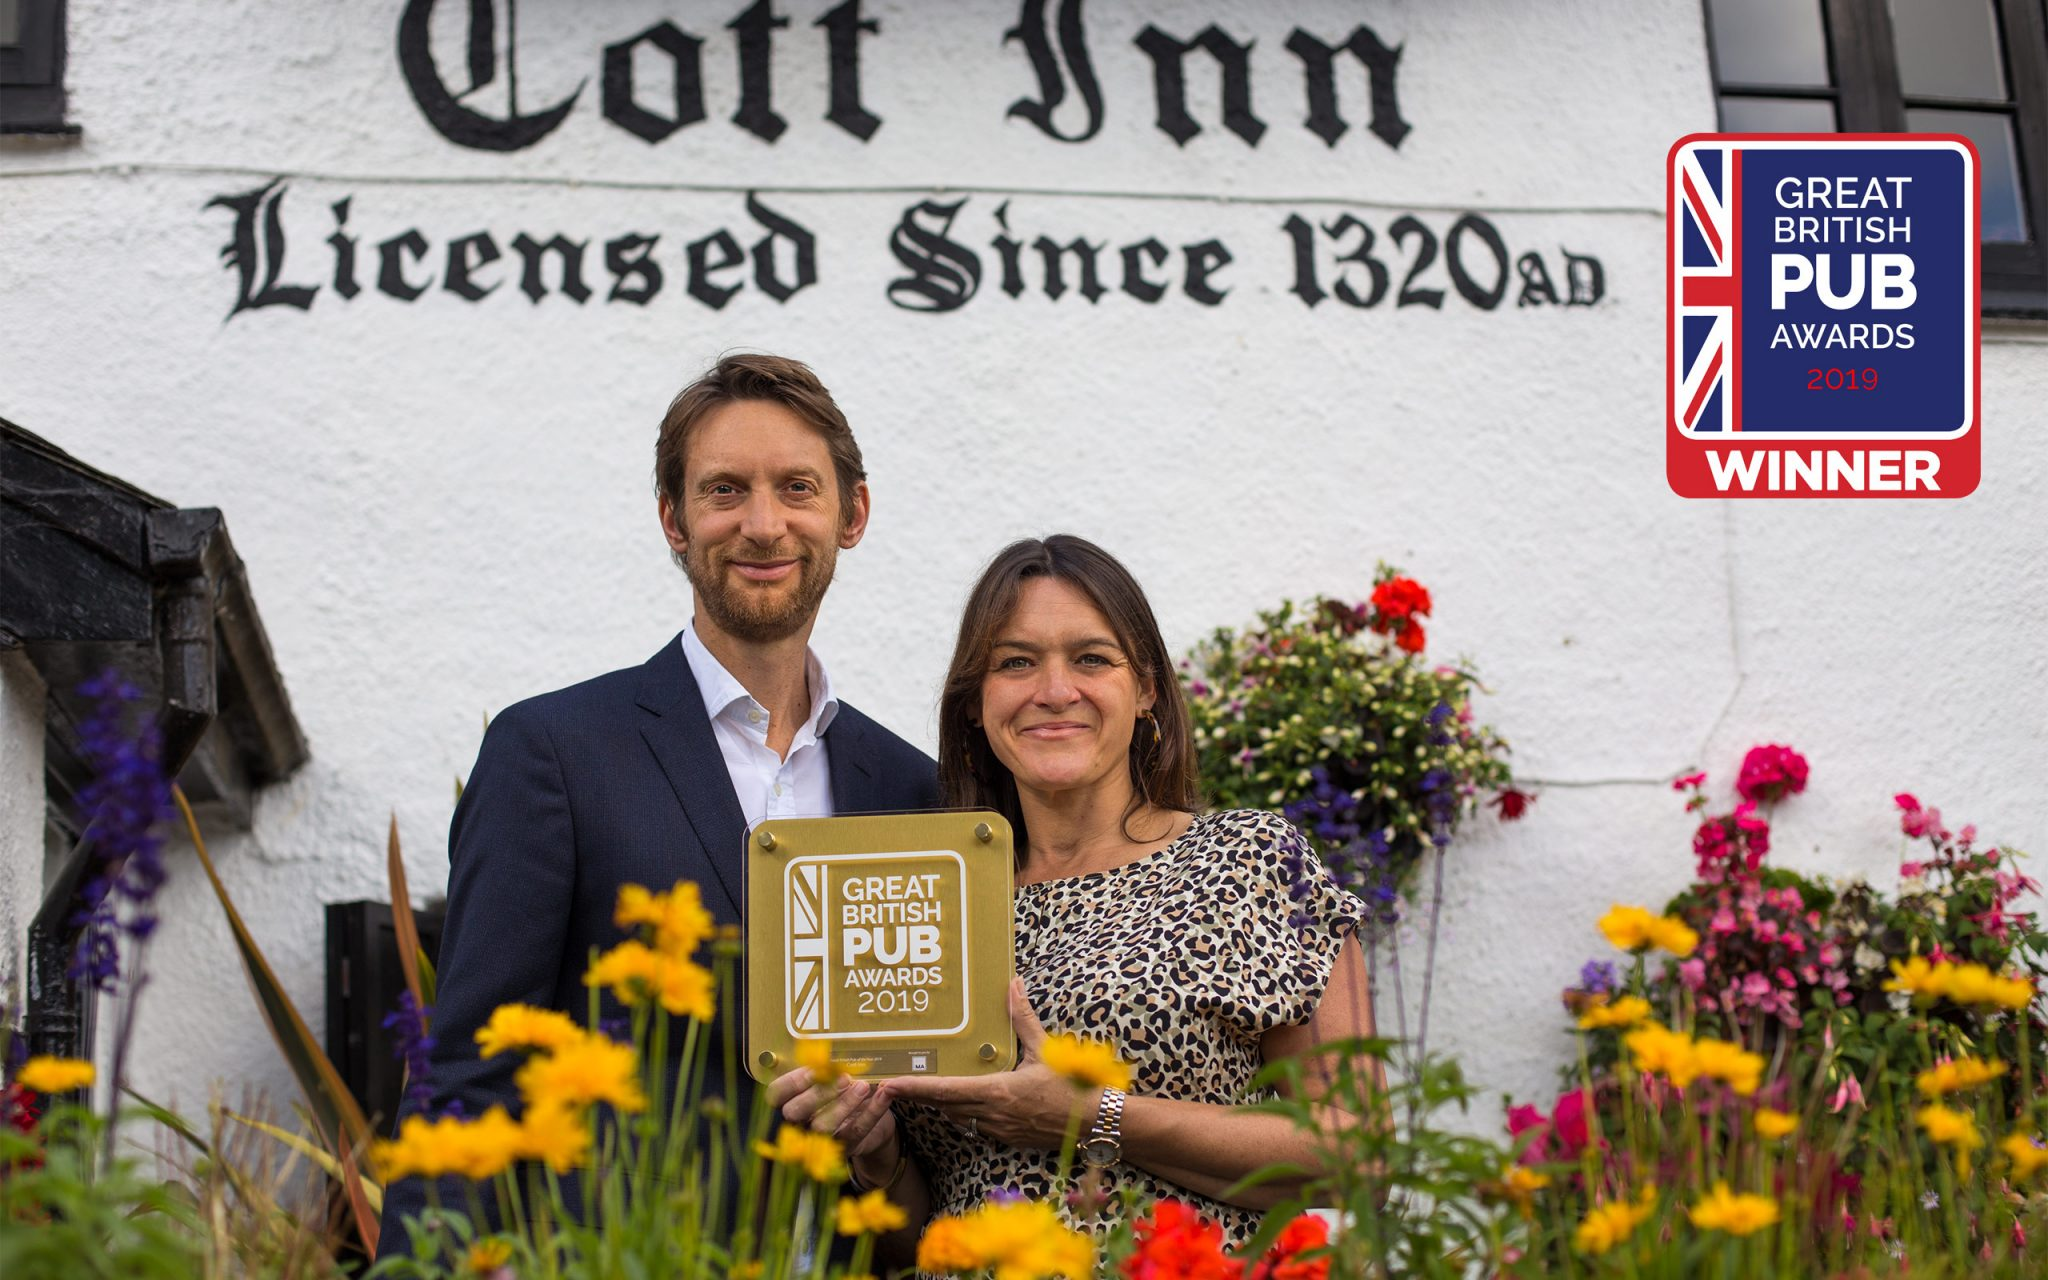 "WINNER OF THE GREAT BRITISH PUB AWARDS 2019. Royal Lancaster Hotel in London THE COTT INN won ""BEST PUB IN BRITAIN"""